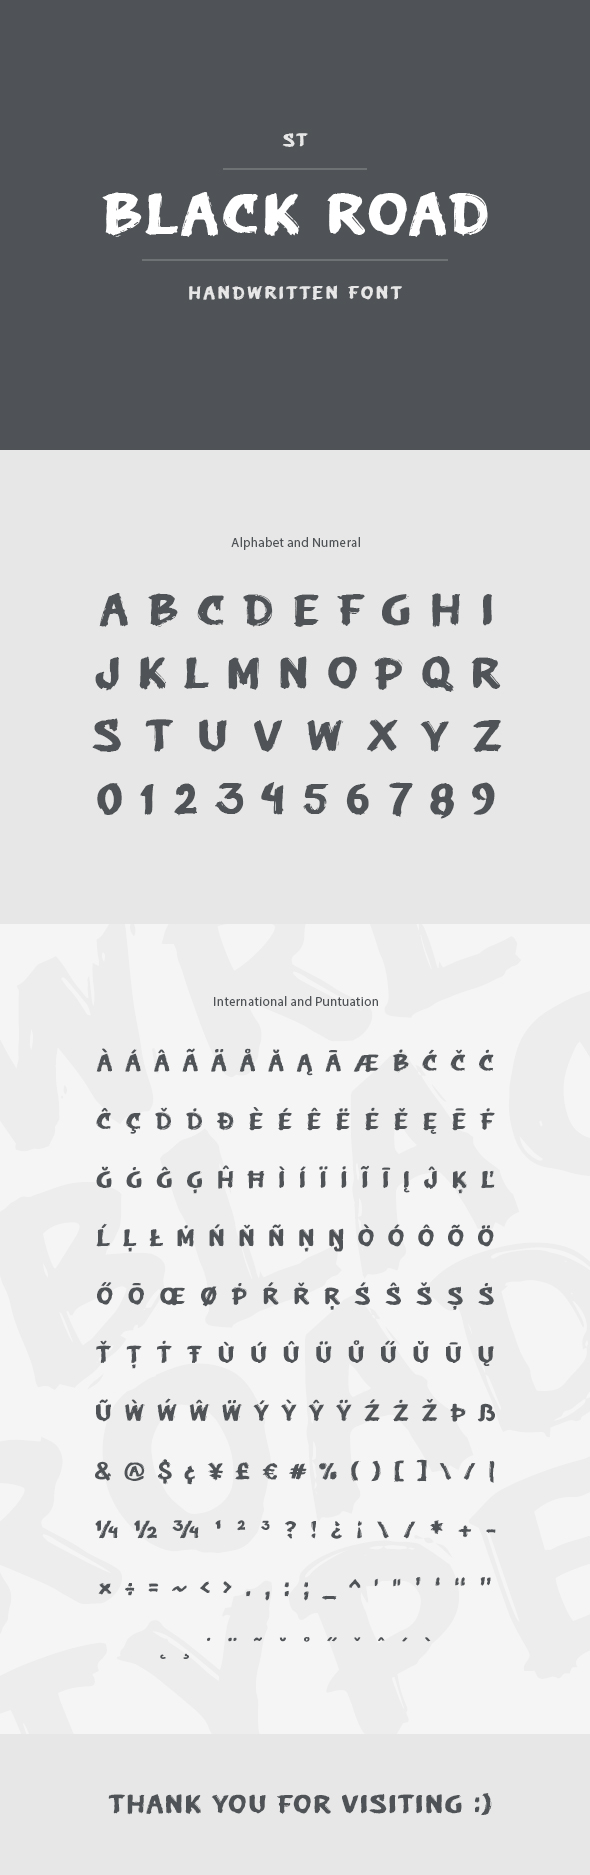 Black Road Font - Hand-writing Script